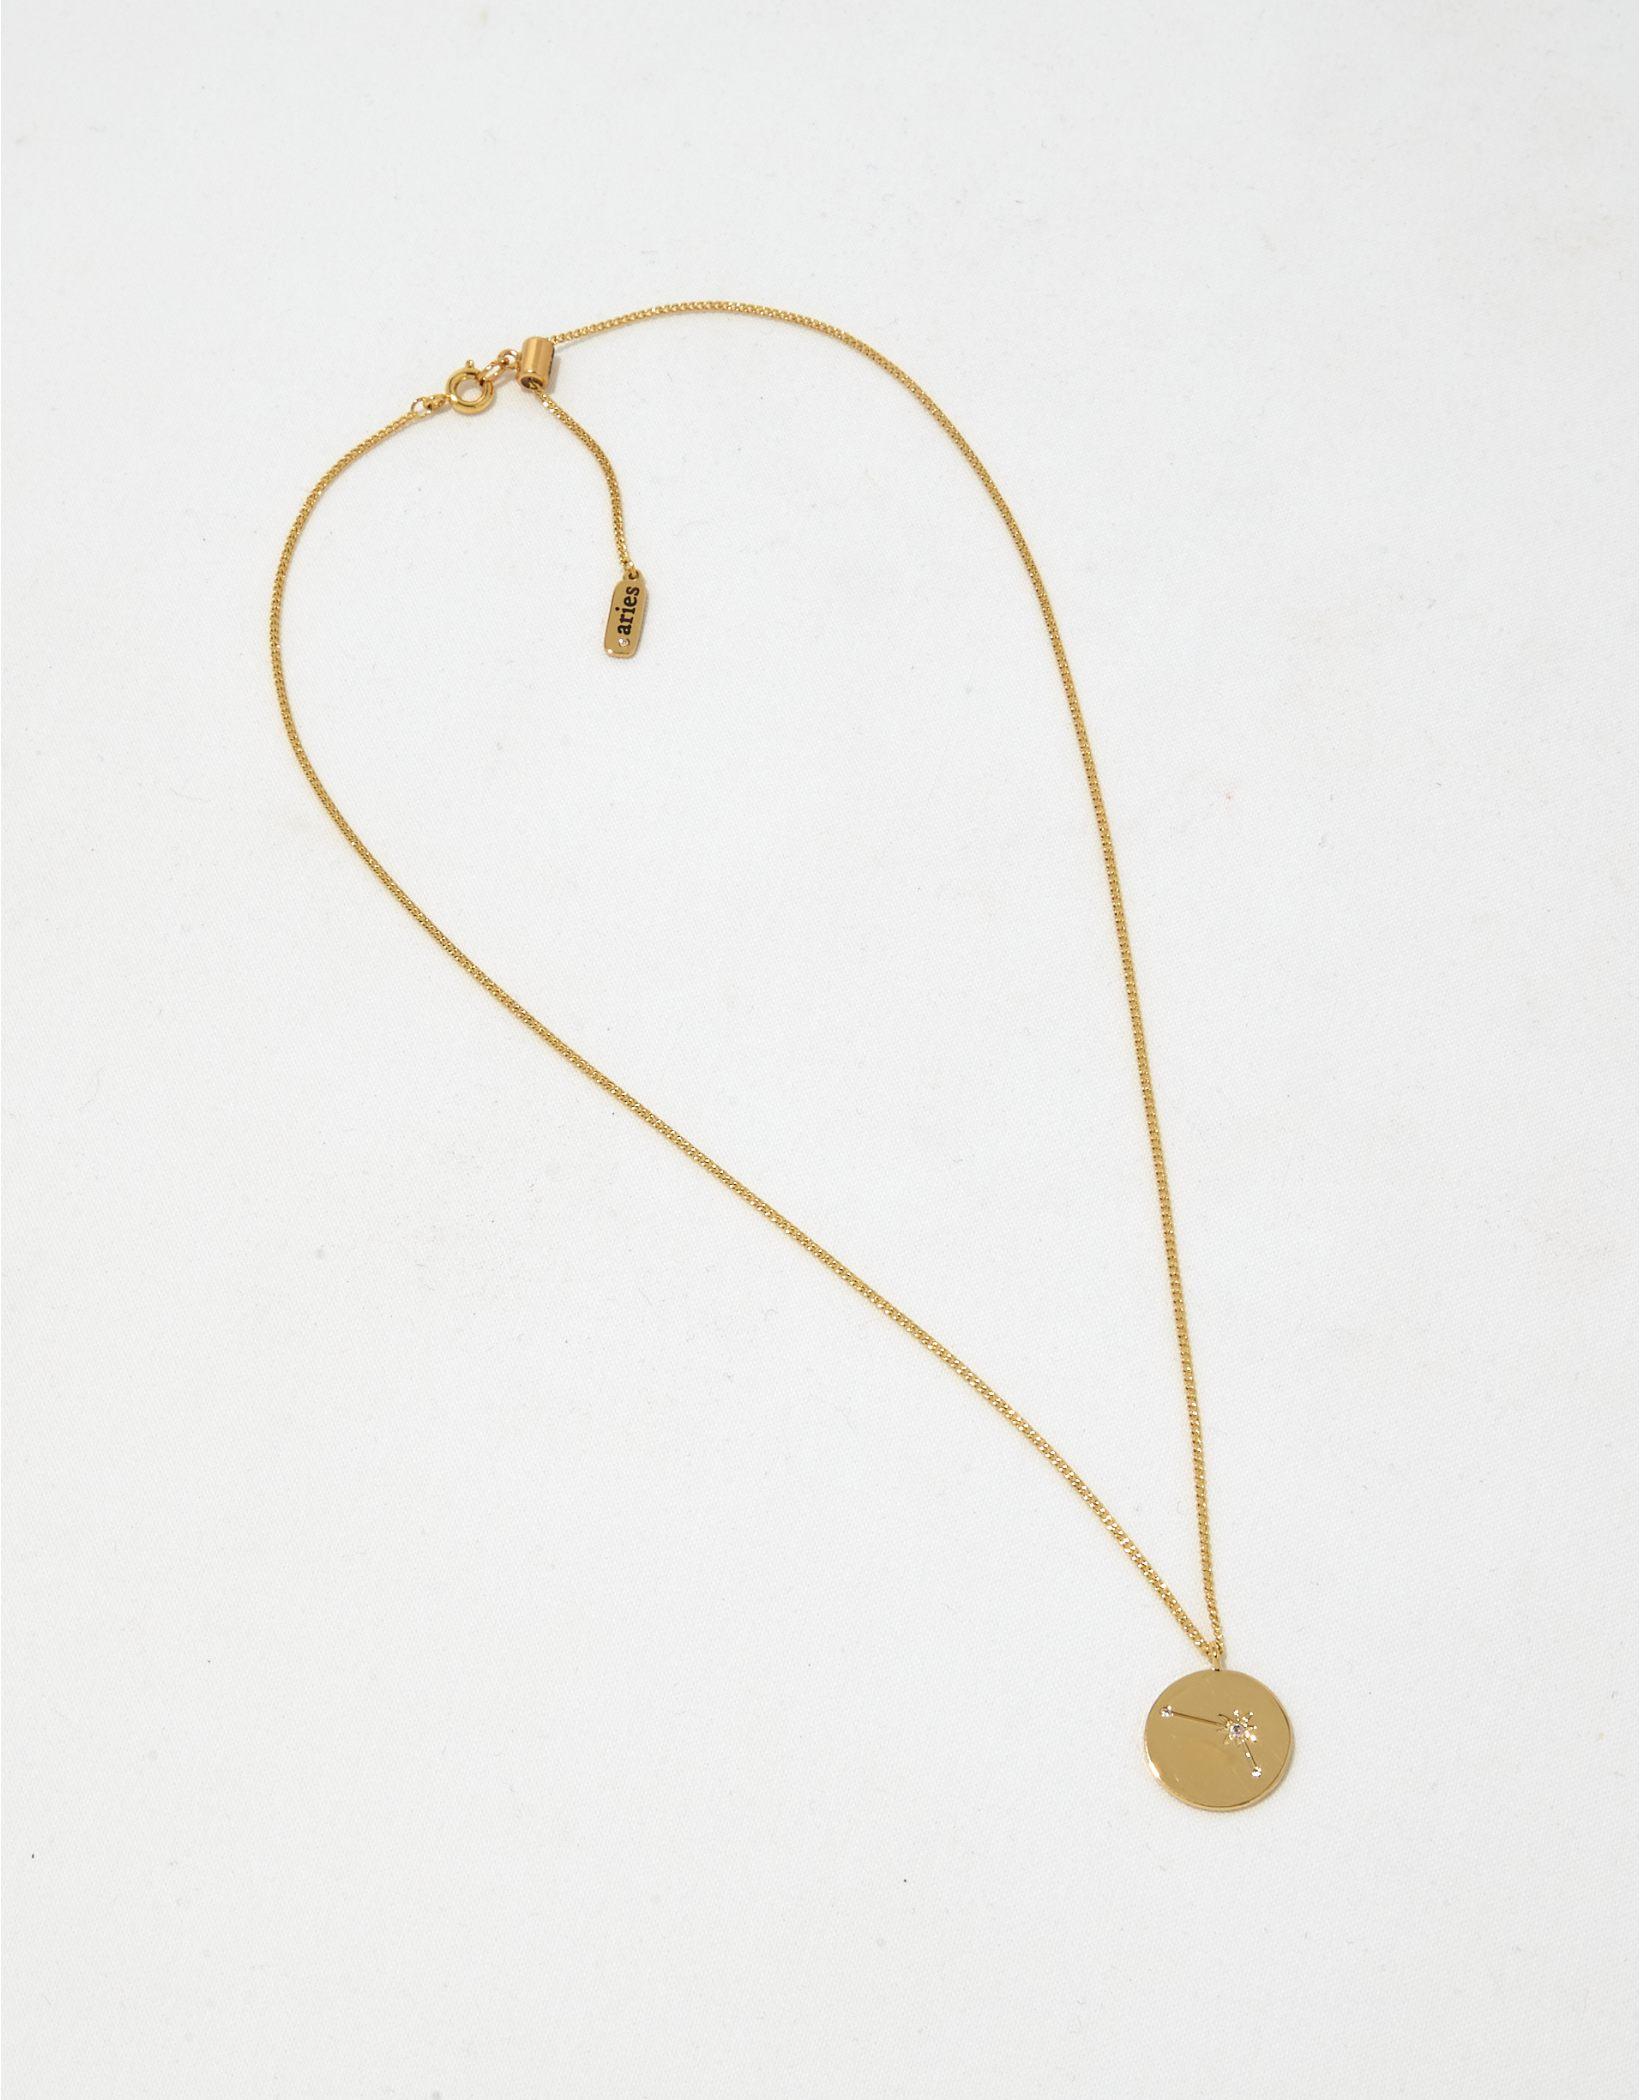 Aerie 14K Gold Zodiac Necklace